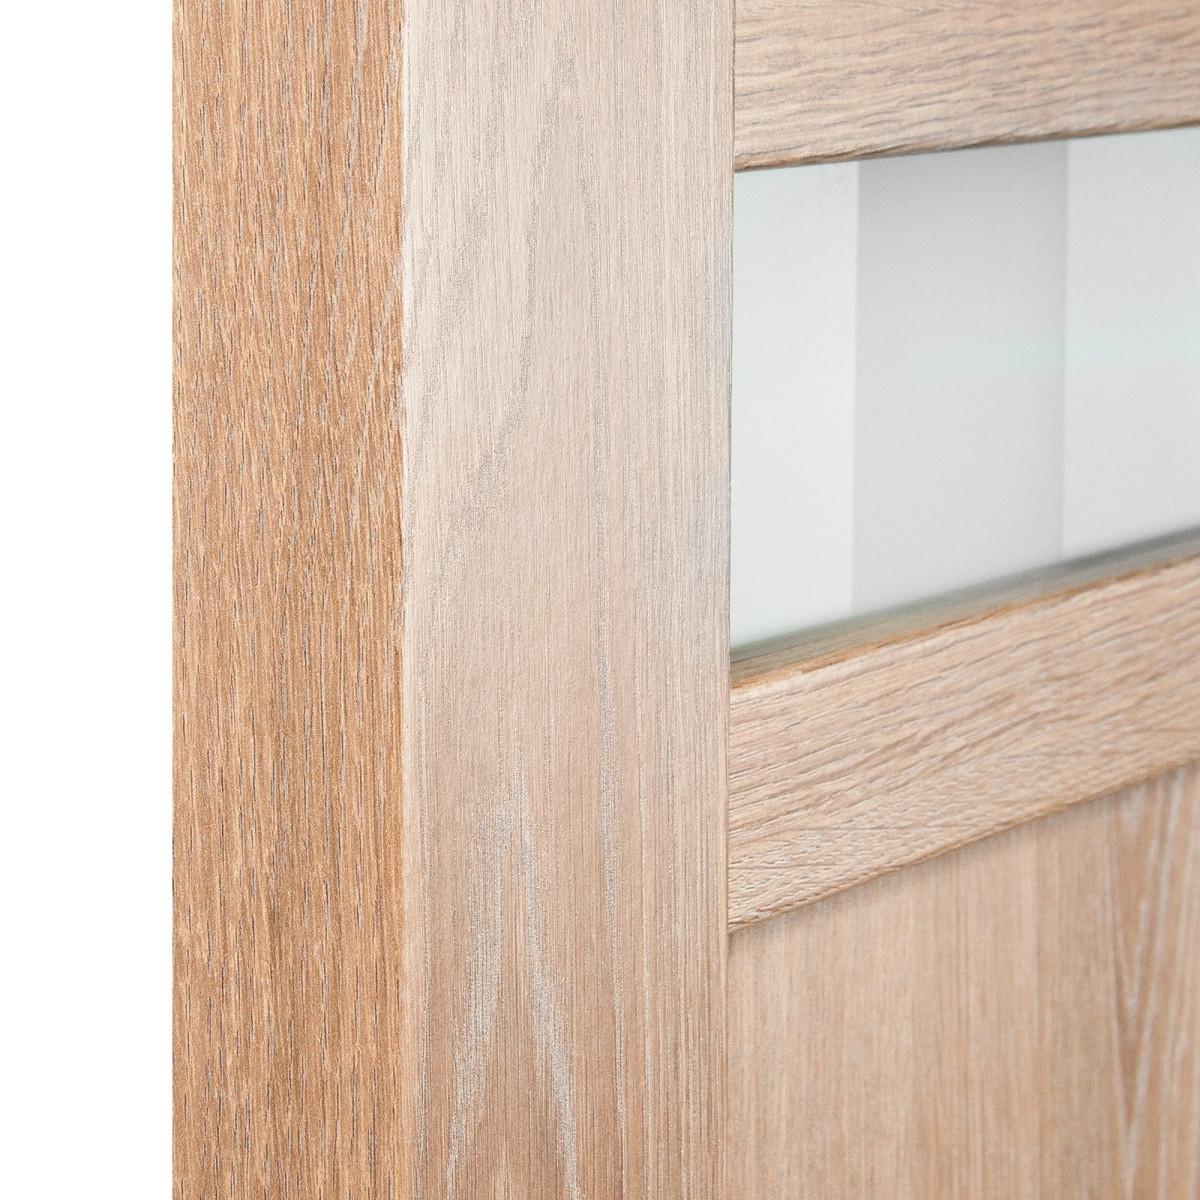 Дверь Межкомнатная Глухая Риволо 80x200 Цвет Натуральный Дуб